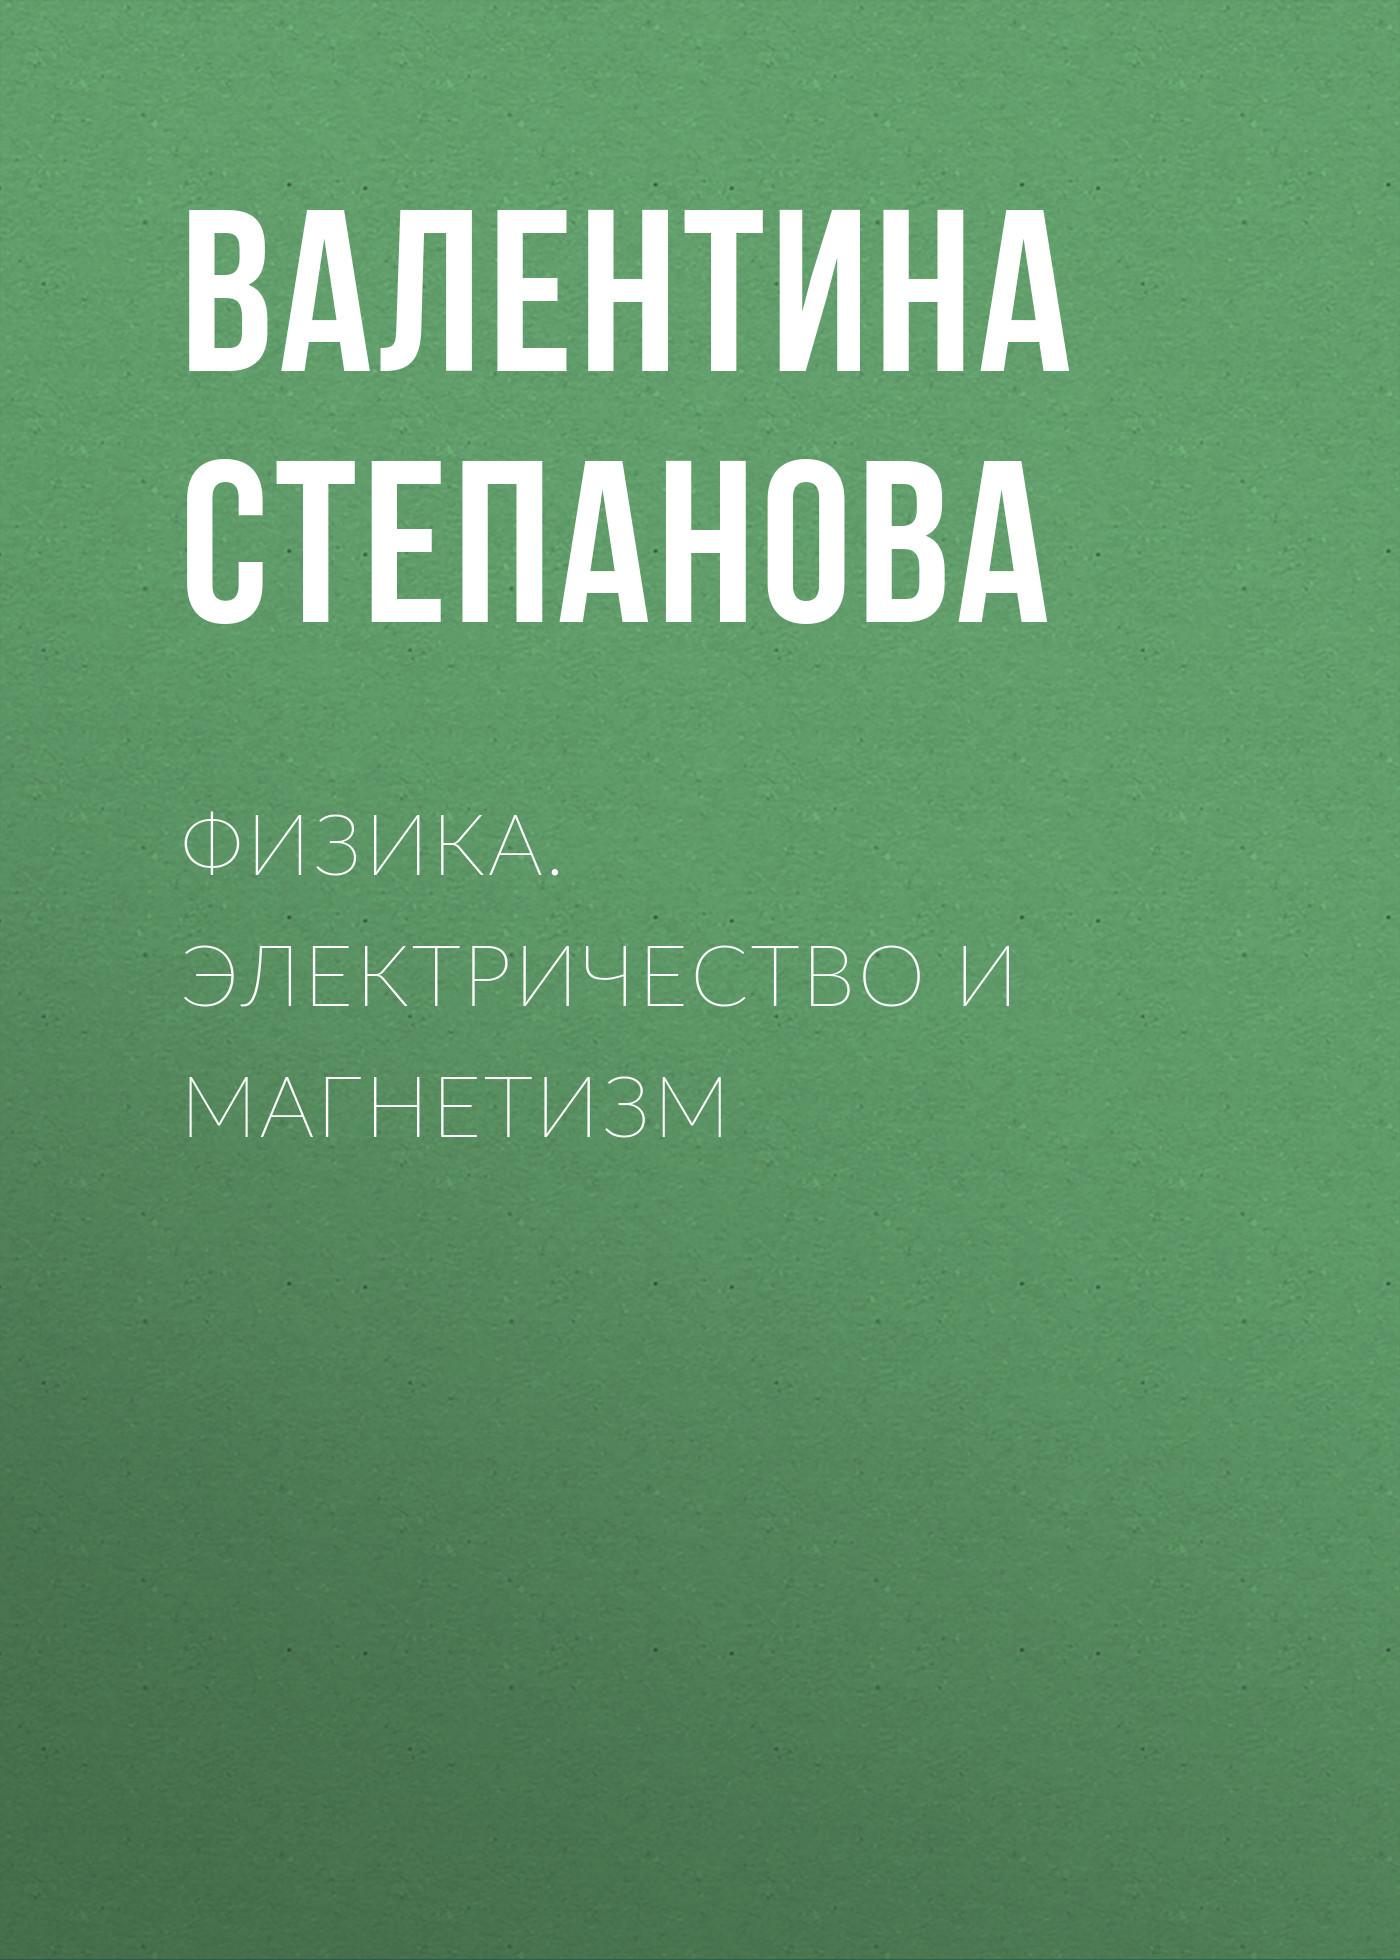 Валентина Степанова. Физика. Электричество и магнетизм